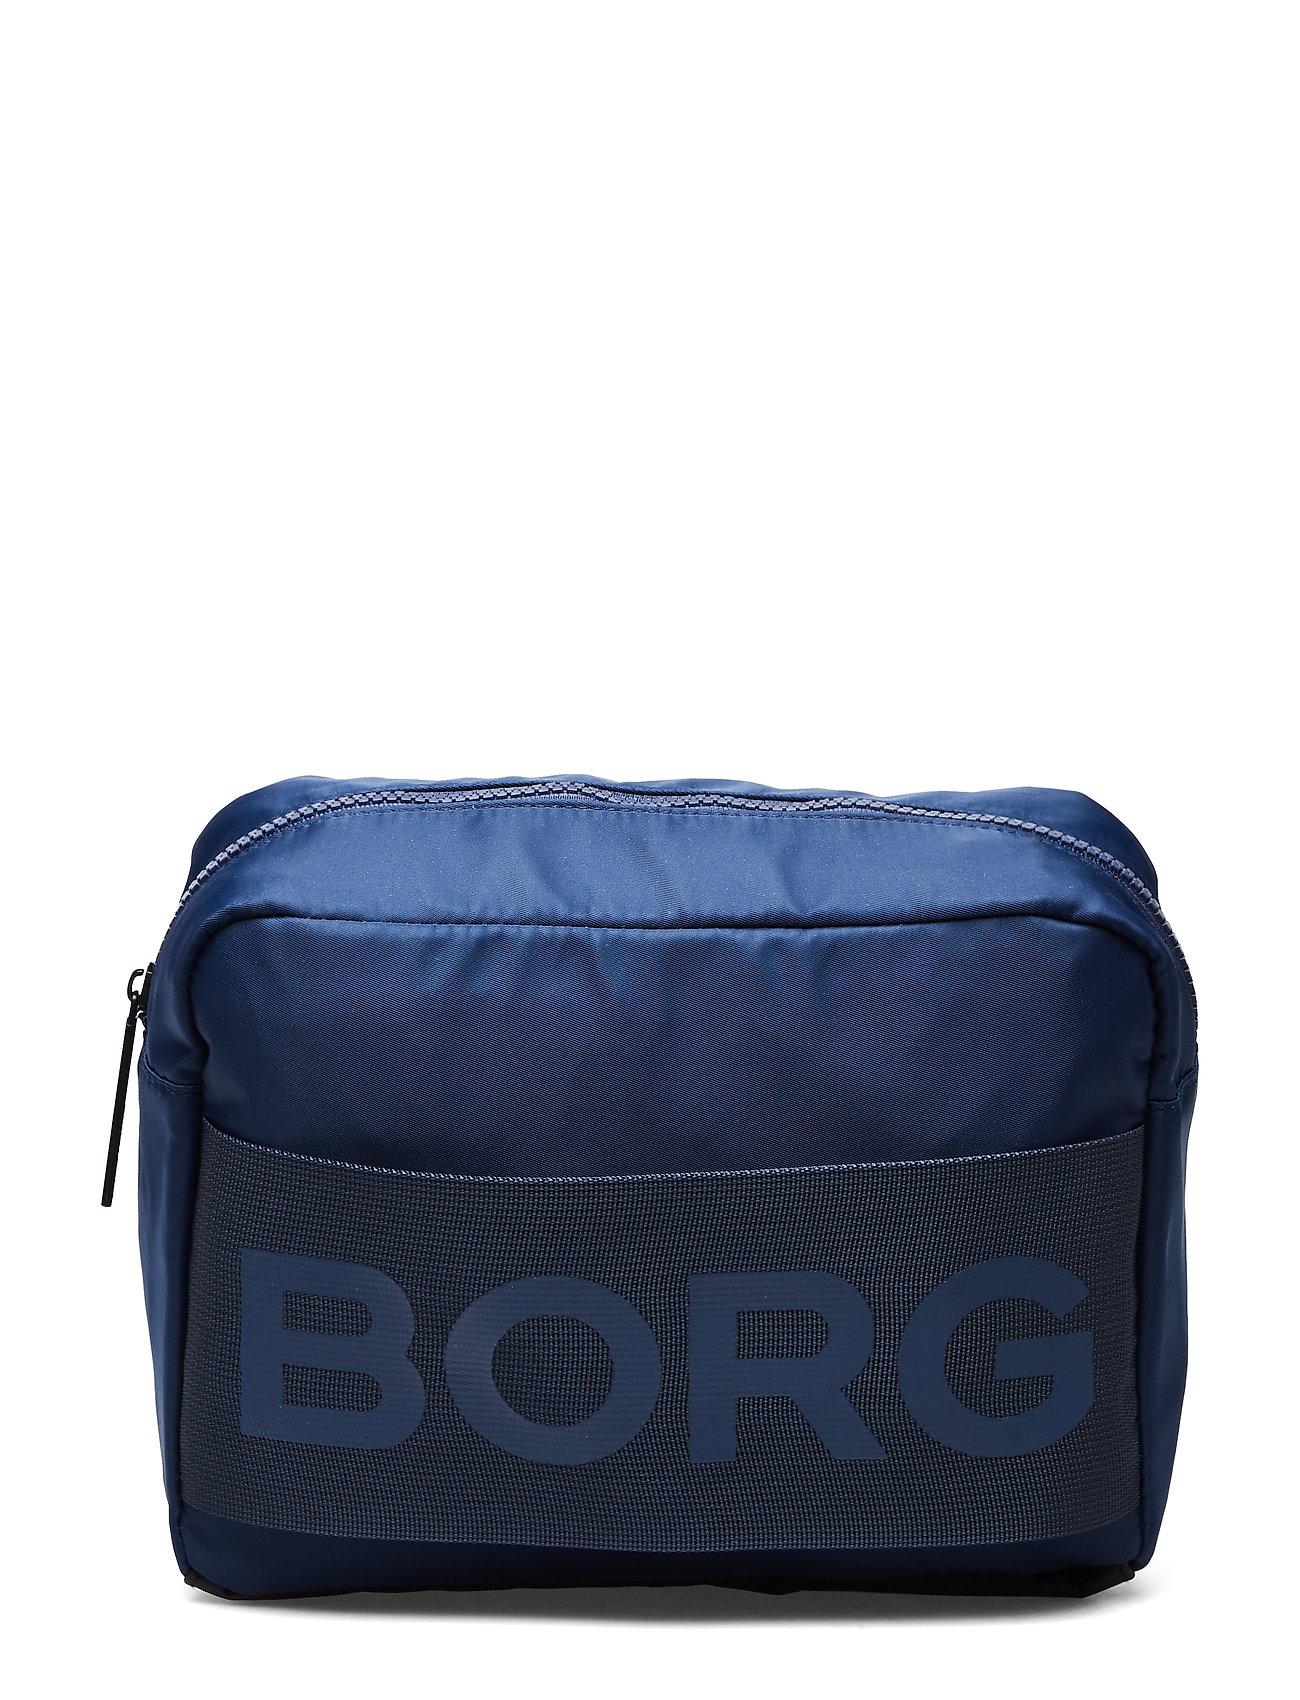 Björn Borg Bags COCO - NAVY